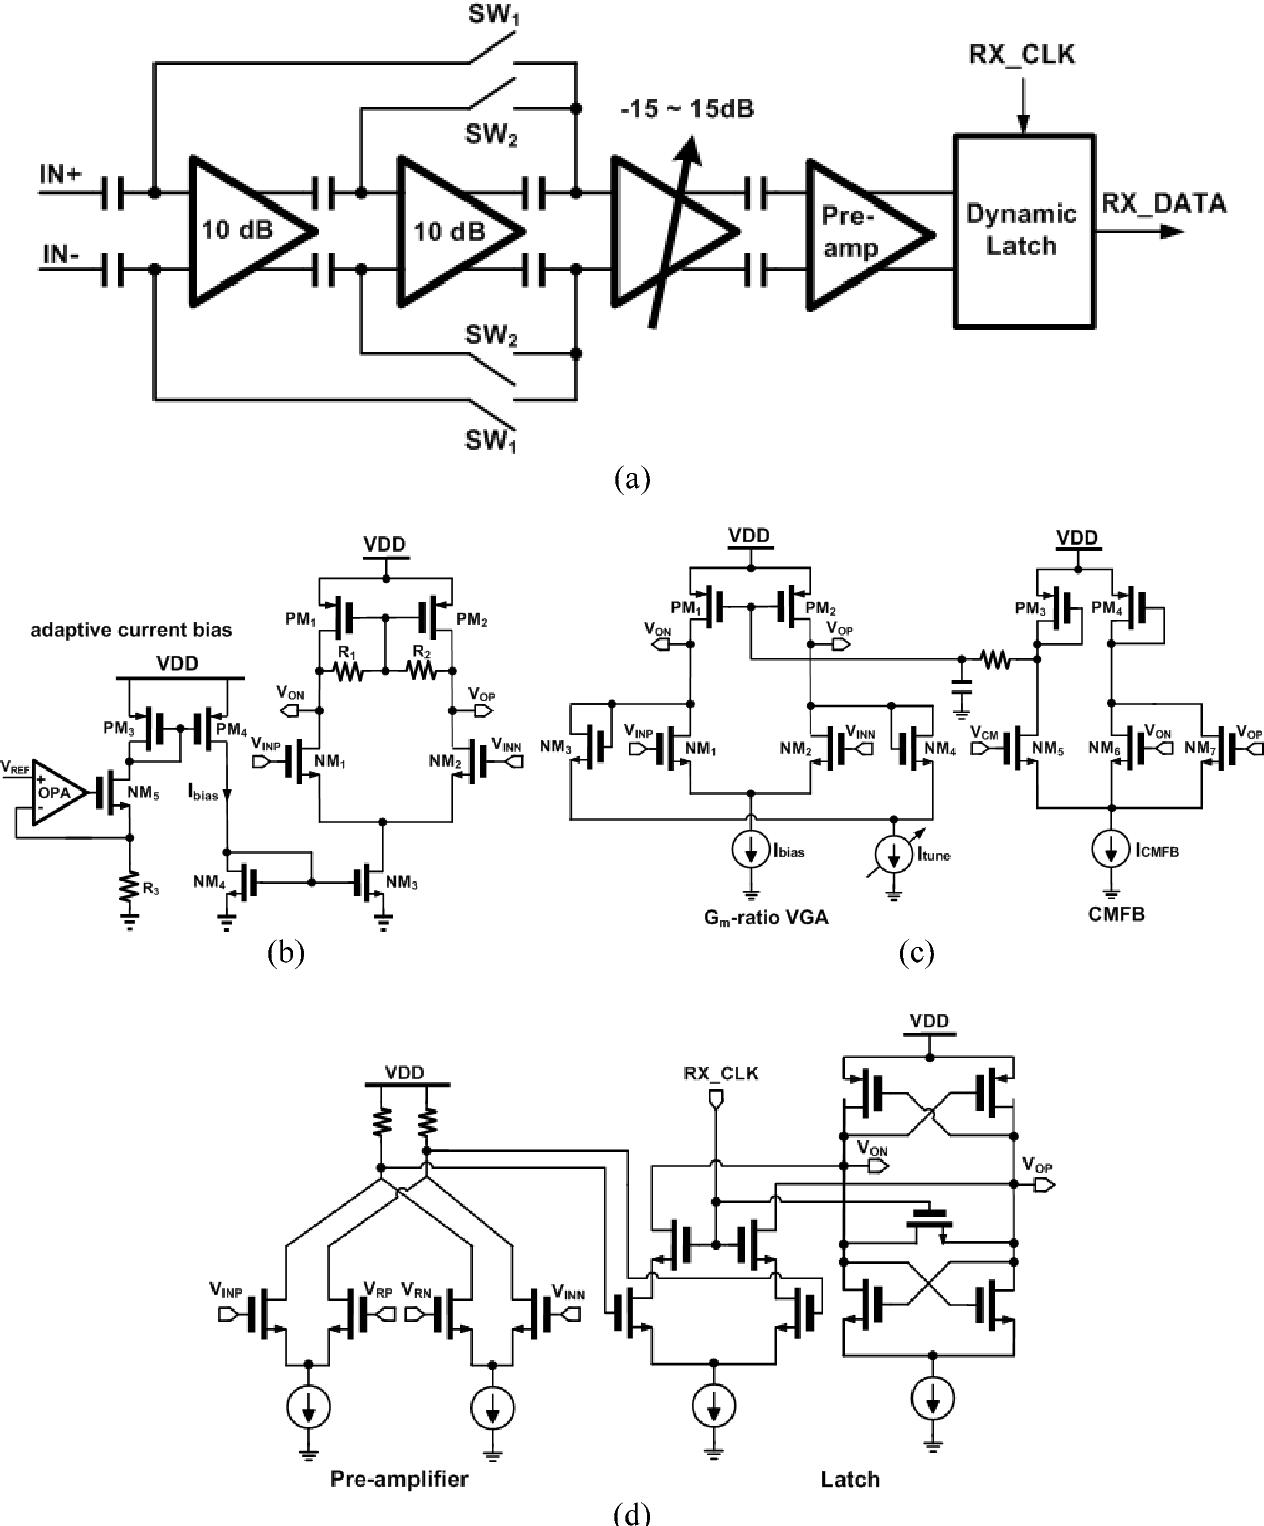 hight resolution of figure 7 a analog baseband chain block diagram b schematic